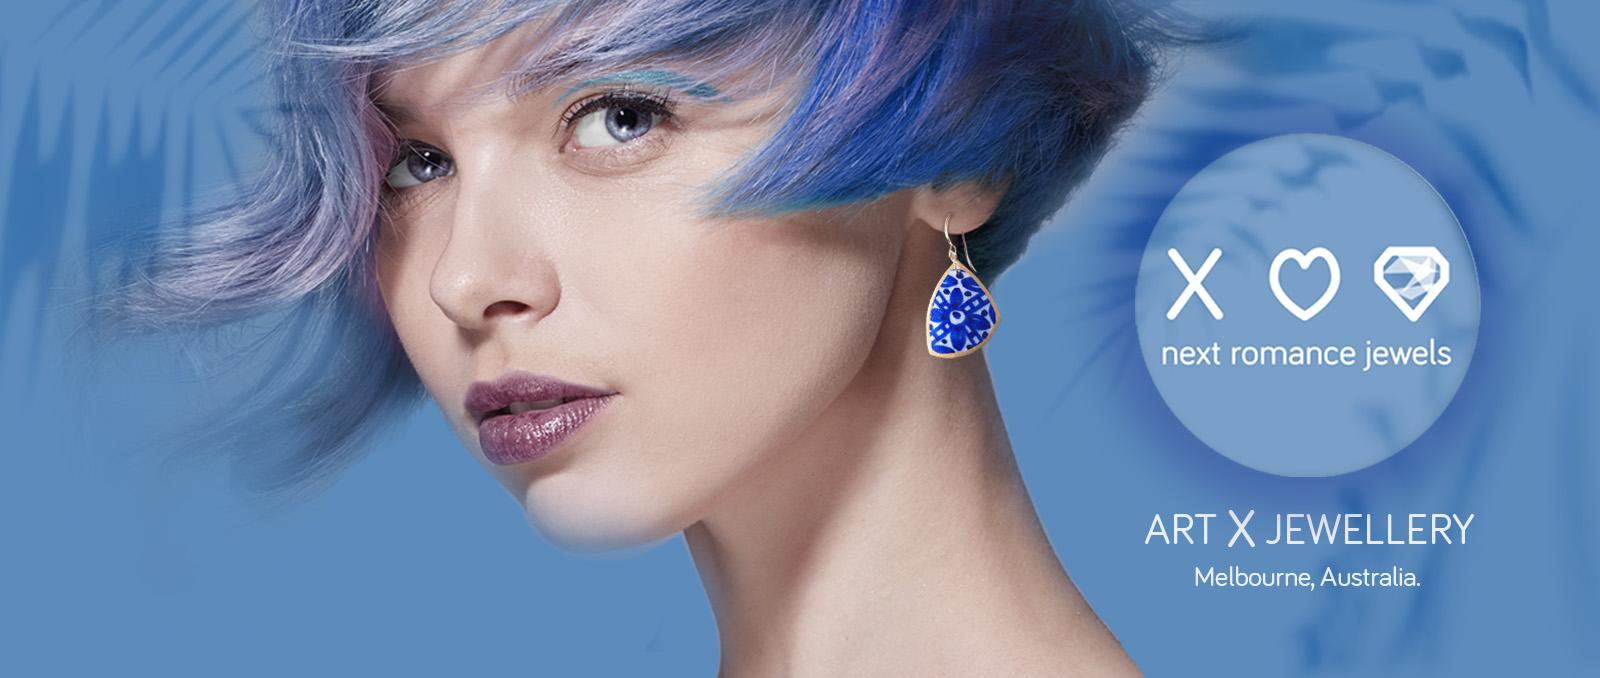 Blue ceramic organic shape art earrings WEB header NEXT ROMANCE banner 1600×678 copy